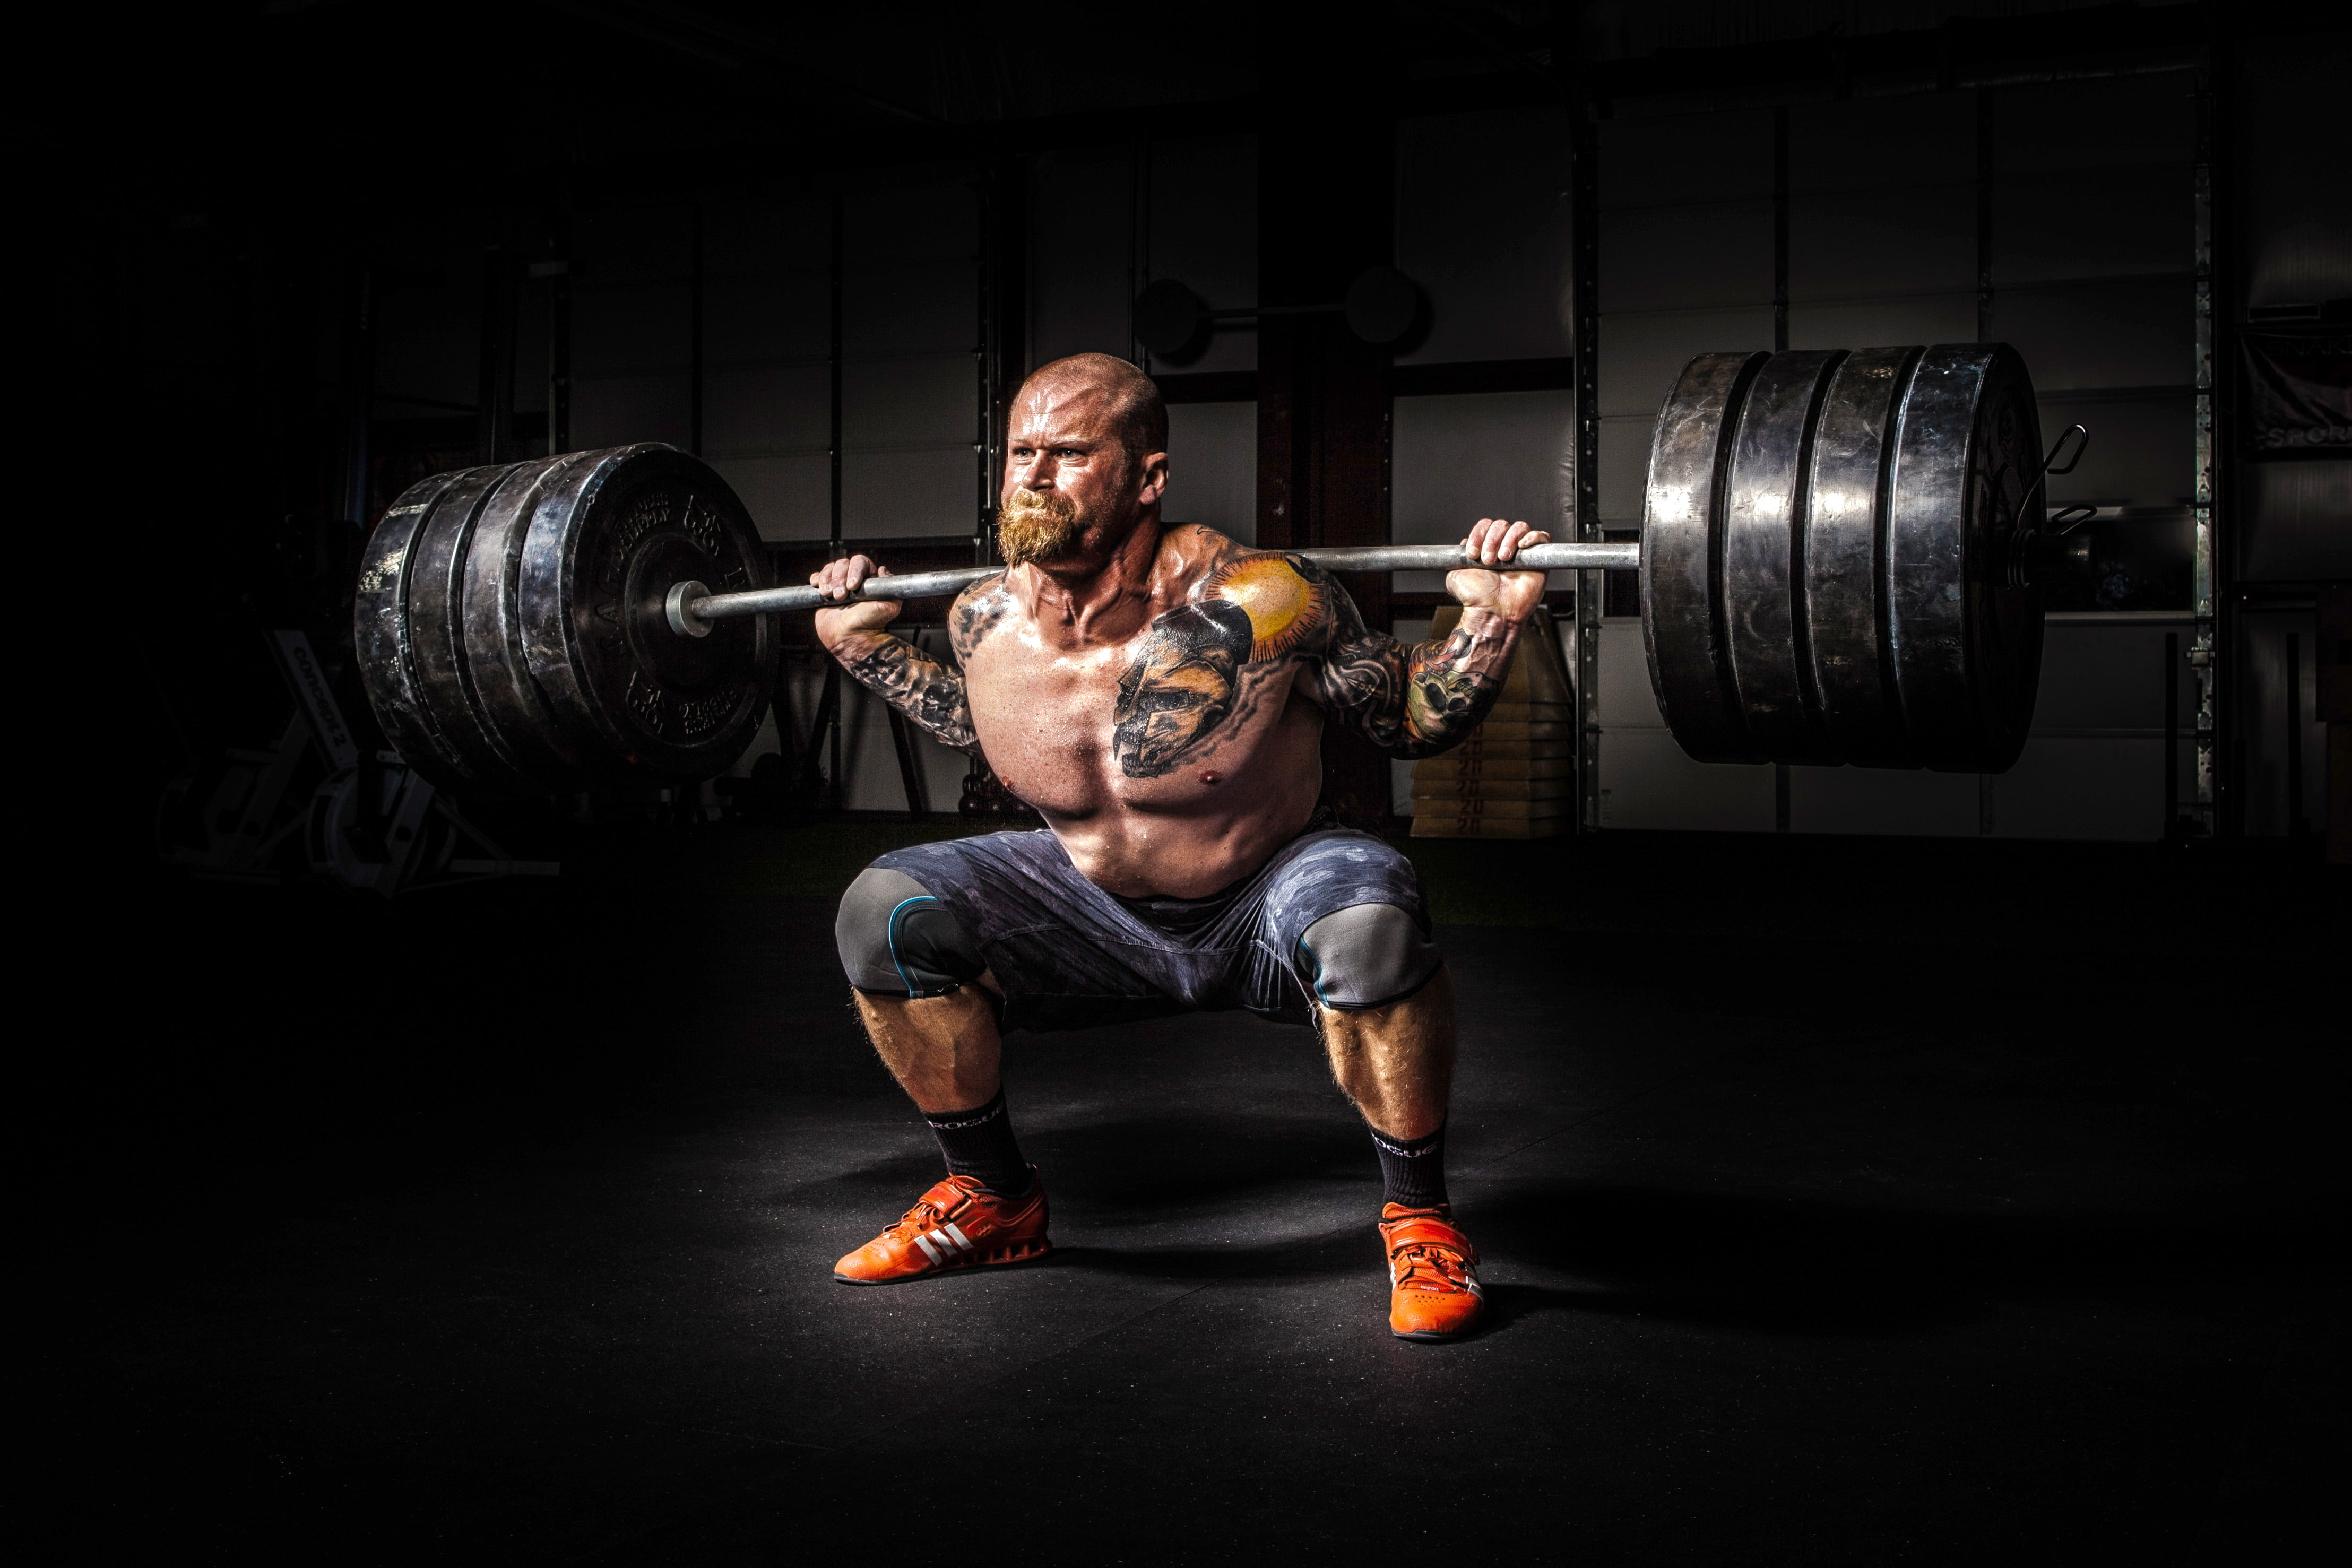 Man person power strength HD wallpaper Wallpaper Flare 4432x2955